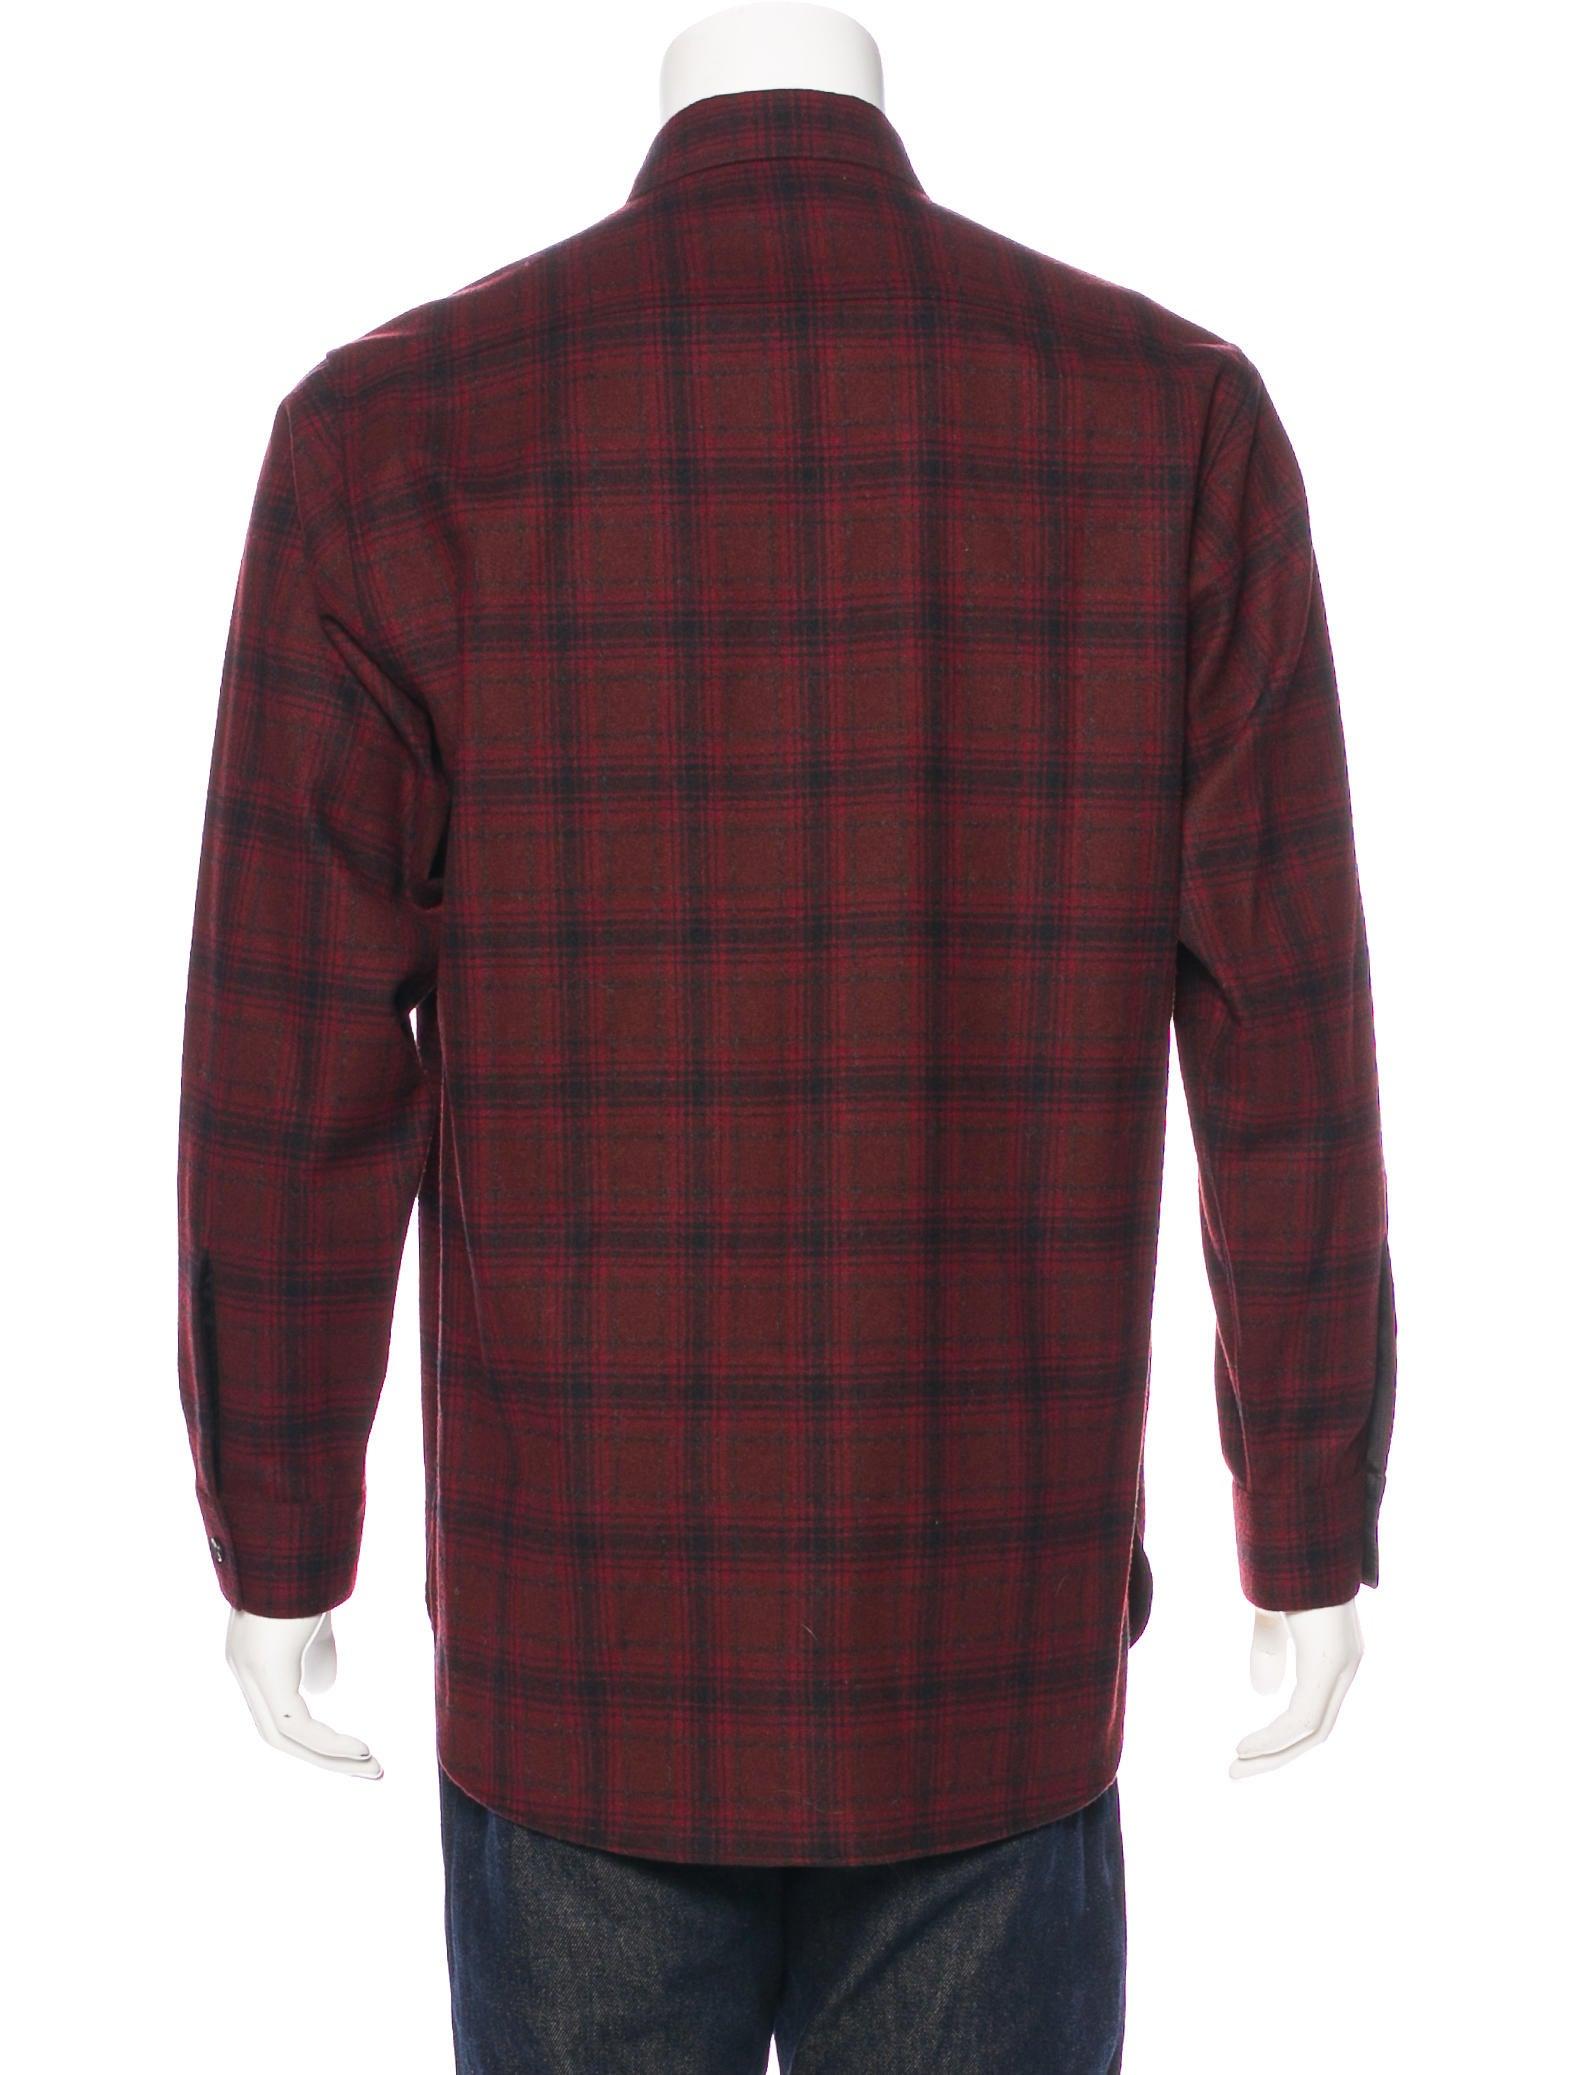 Saint laurent plaid wool flannel shirt clothing for Mens wool flannel shirt